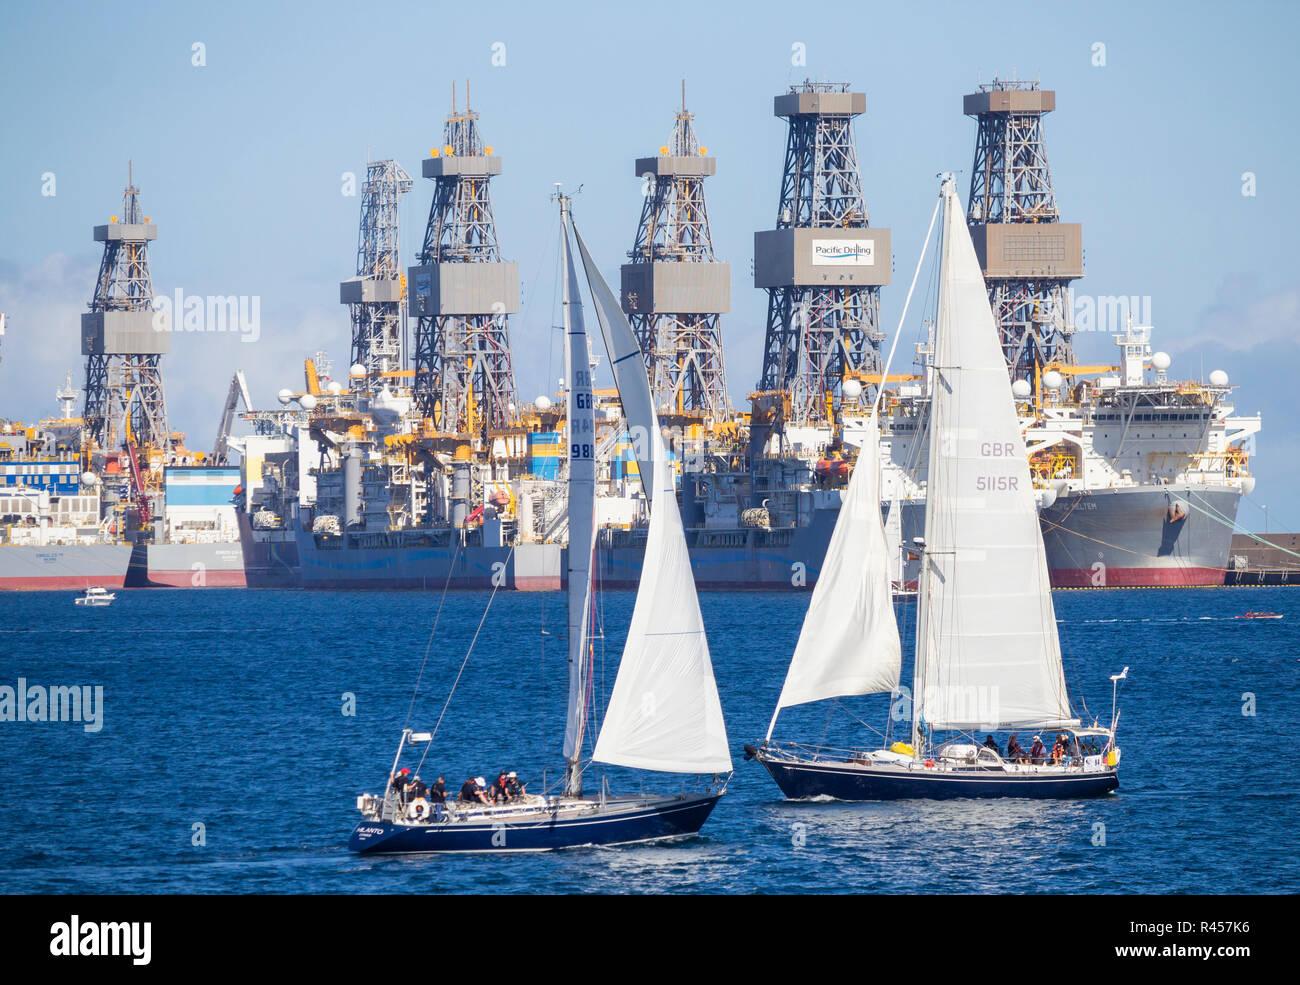 Start of the 2018 ARC (Atlantic Rally for Cruisers) transatlantic race/crossing in Las Palmas, Gran Canaria, Canary Islands, Spain. Stock Photo